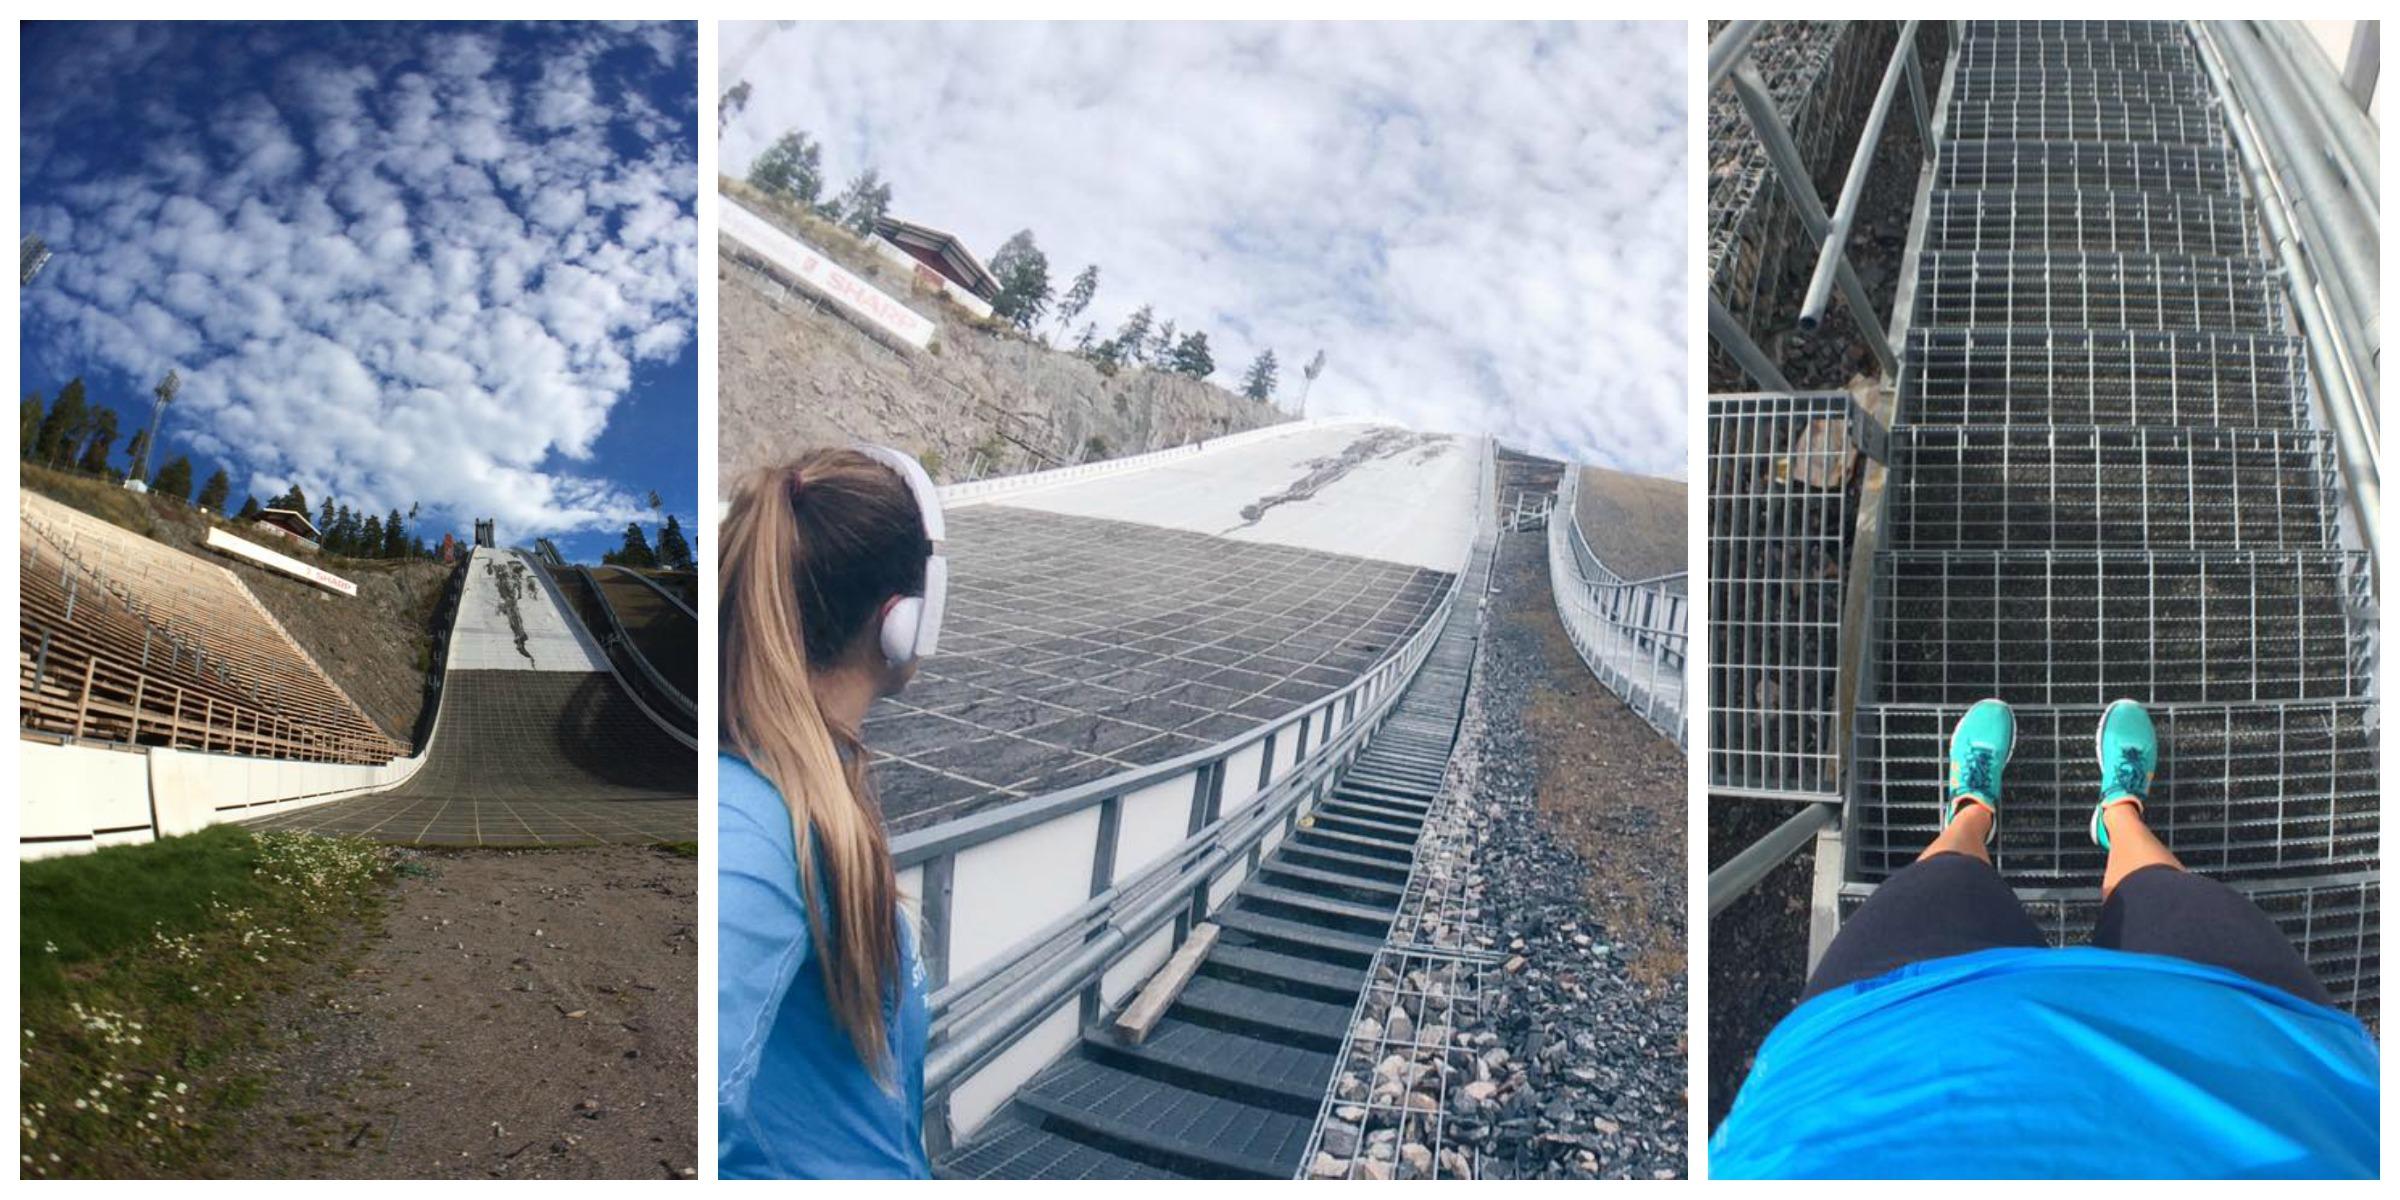 Klara-Fuchs-Lugnet-Collage